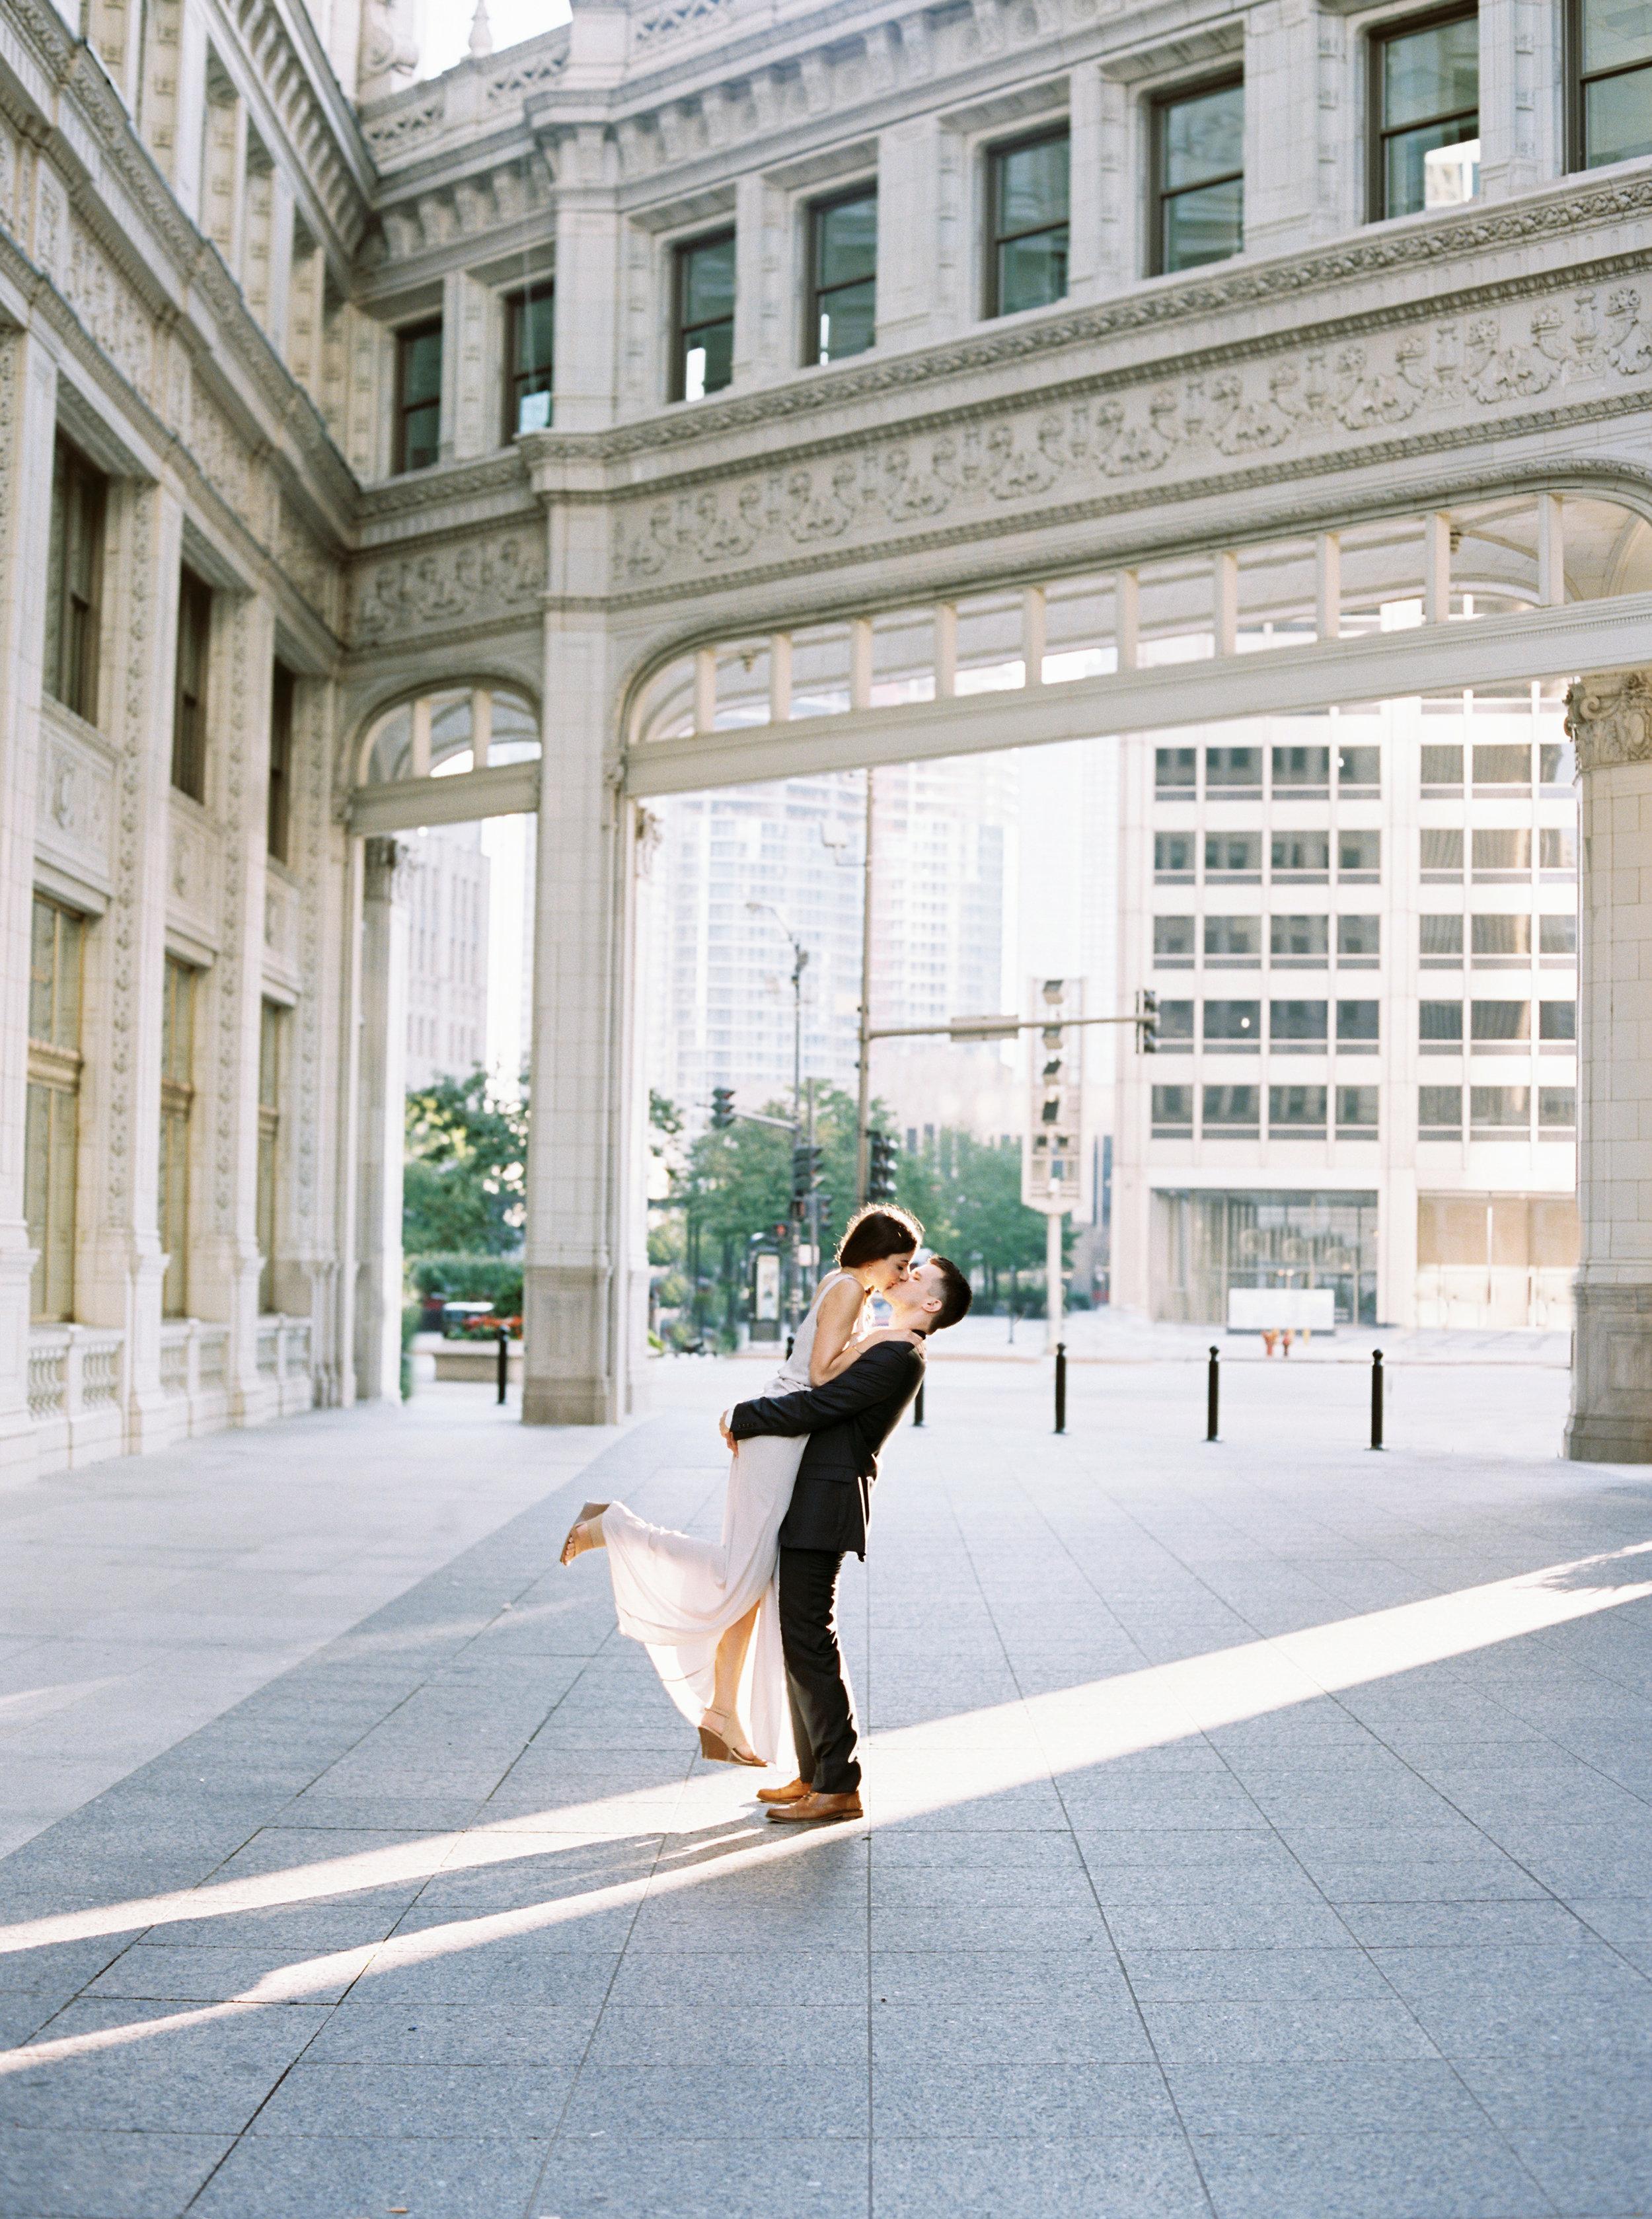 Kyle John l Fine Art Wedding Photography l Chicago, Copenhagen, California, New York, Destination l Blog l Nathalie and Colby_Lake Michigan_Sunrise Engagement_22